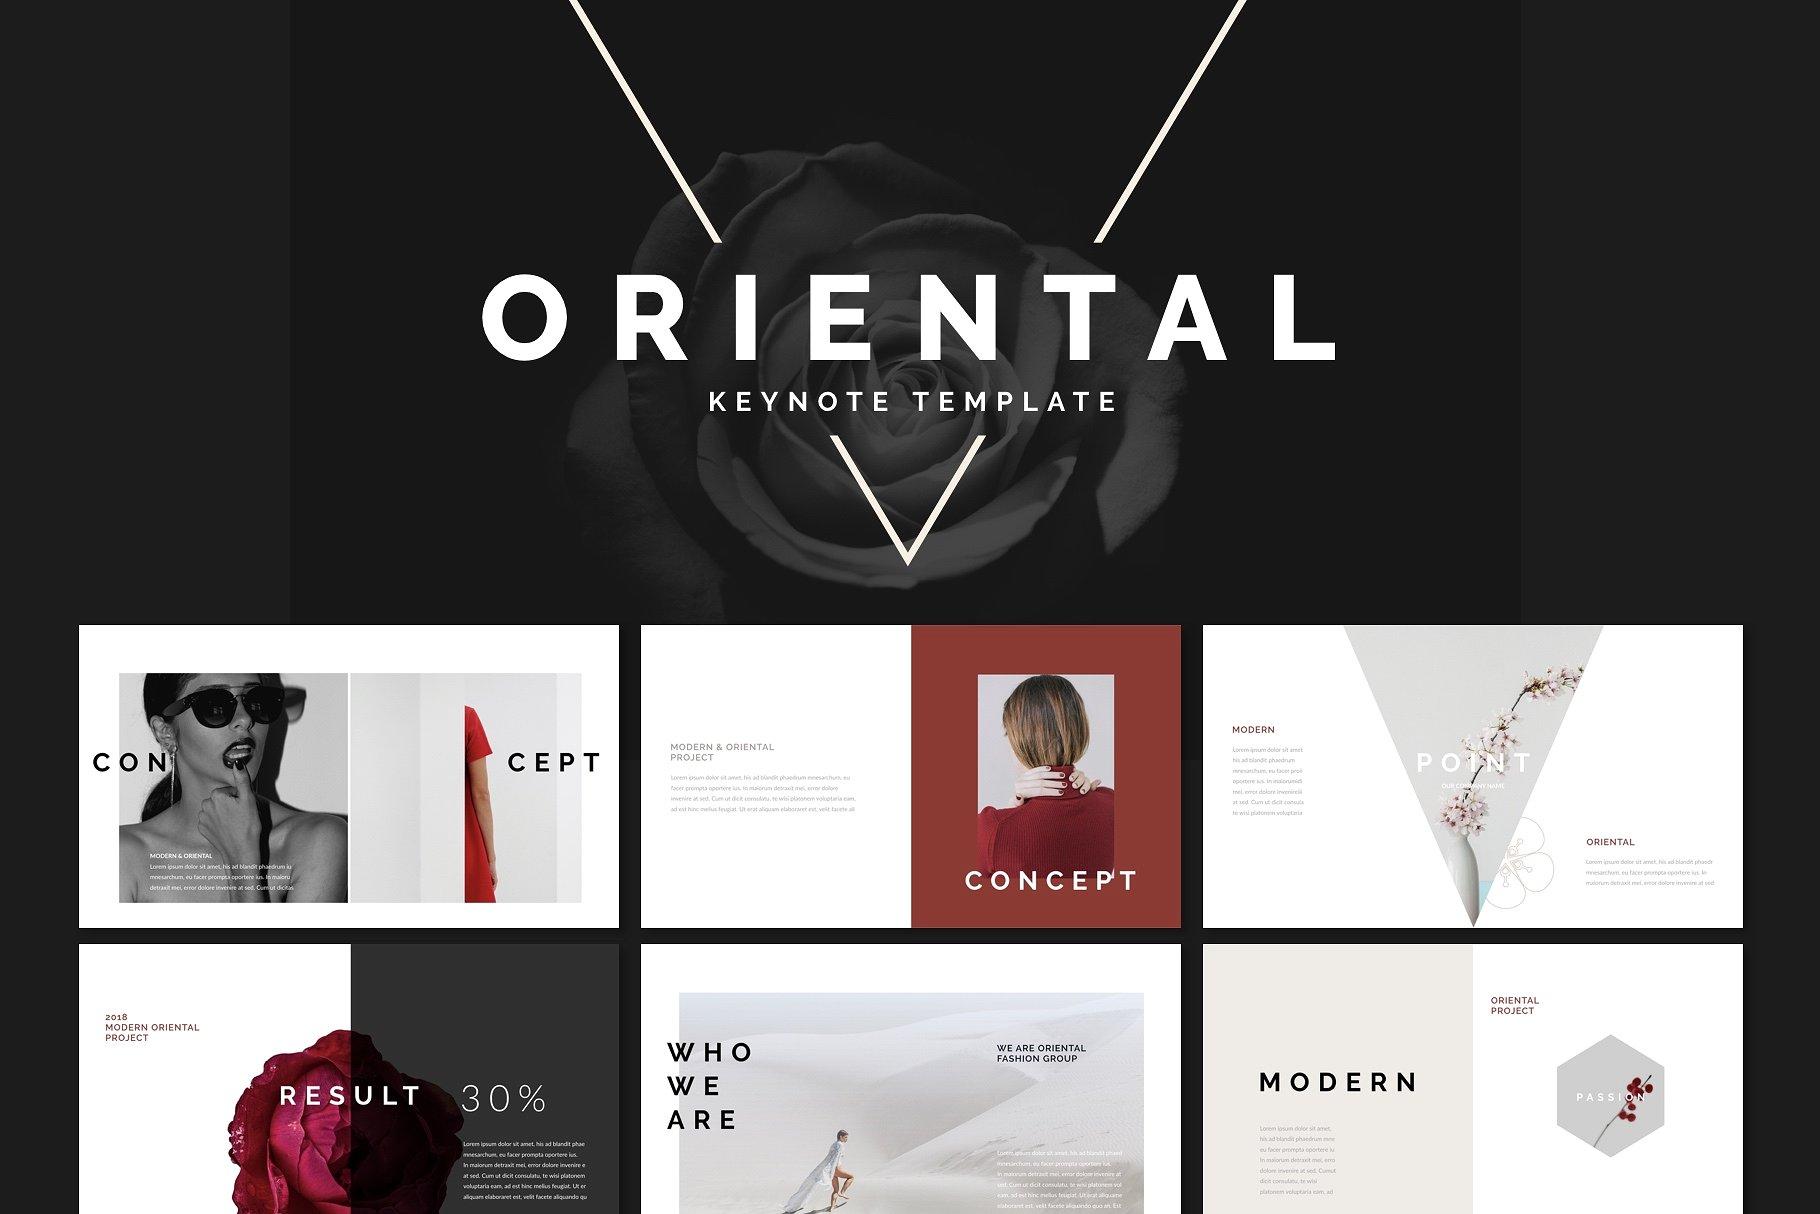 18. Oriental Keynote Template